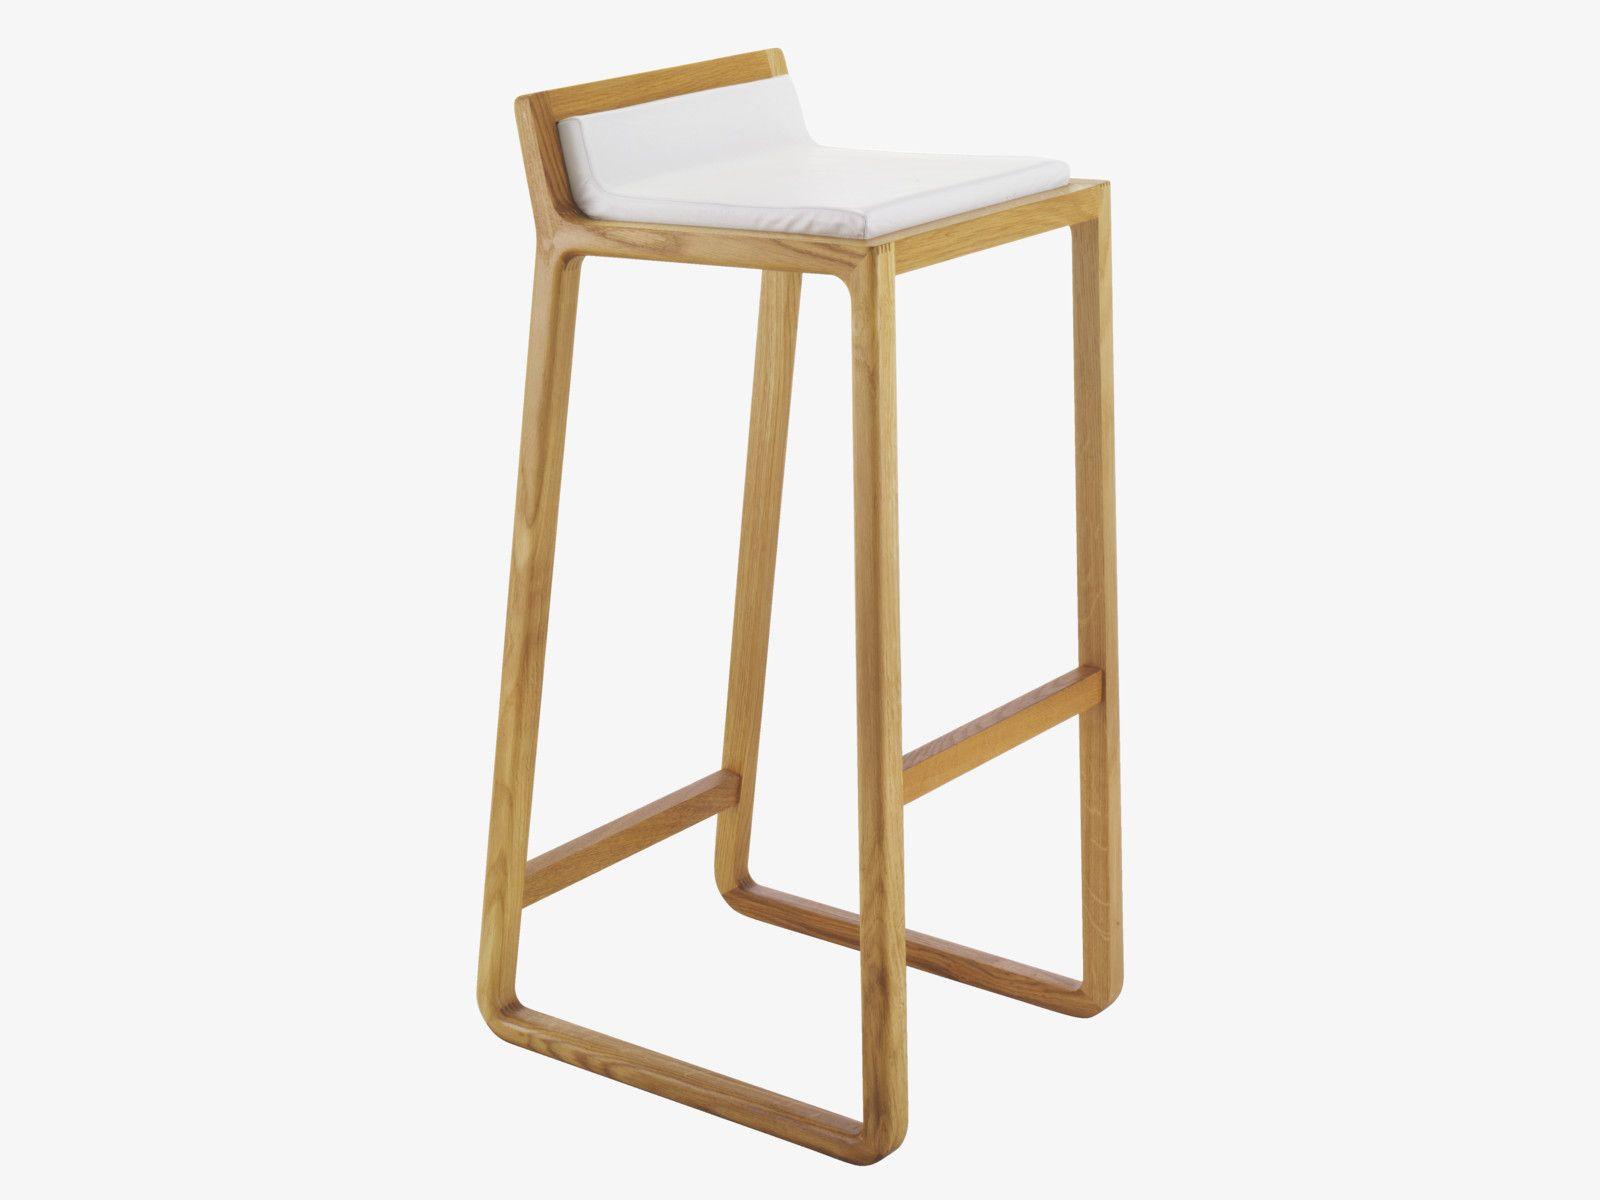 Joe Solid Oak Bar Stool With Leather Upholstered Seat In 2020 Oak Bar Stools Bar Stools Bar Stool Chairs